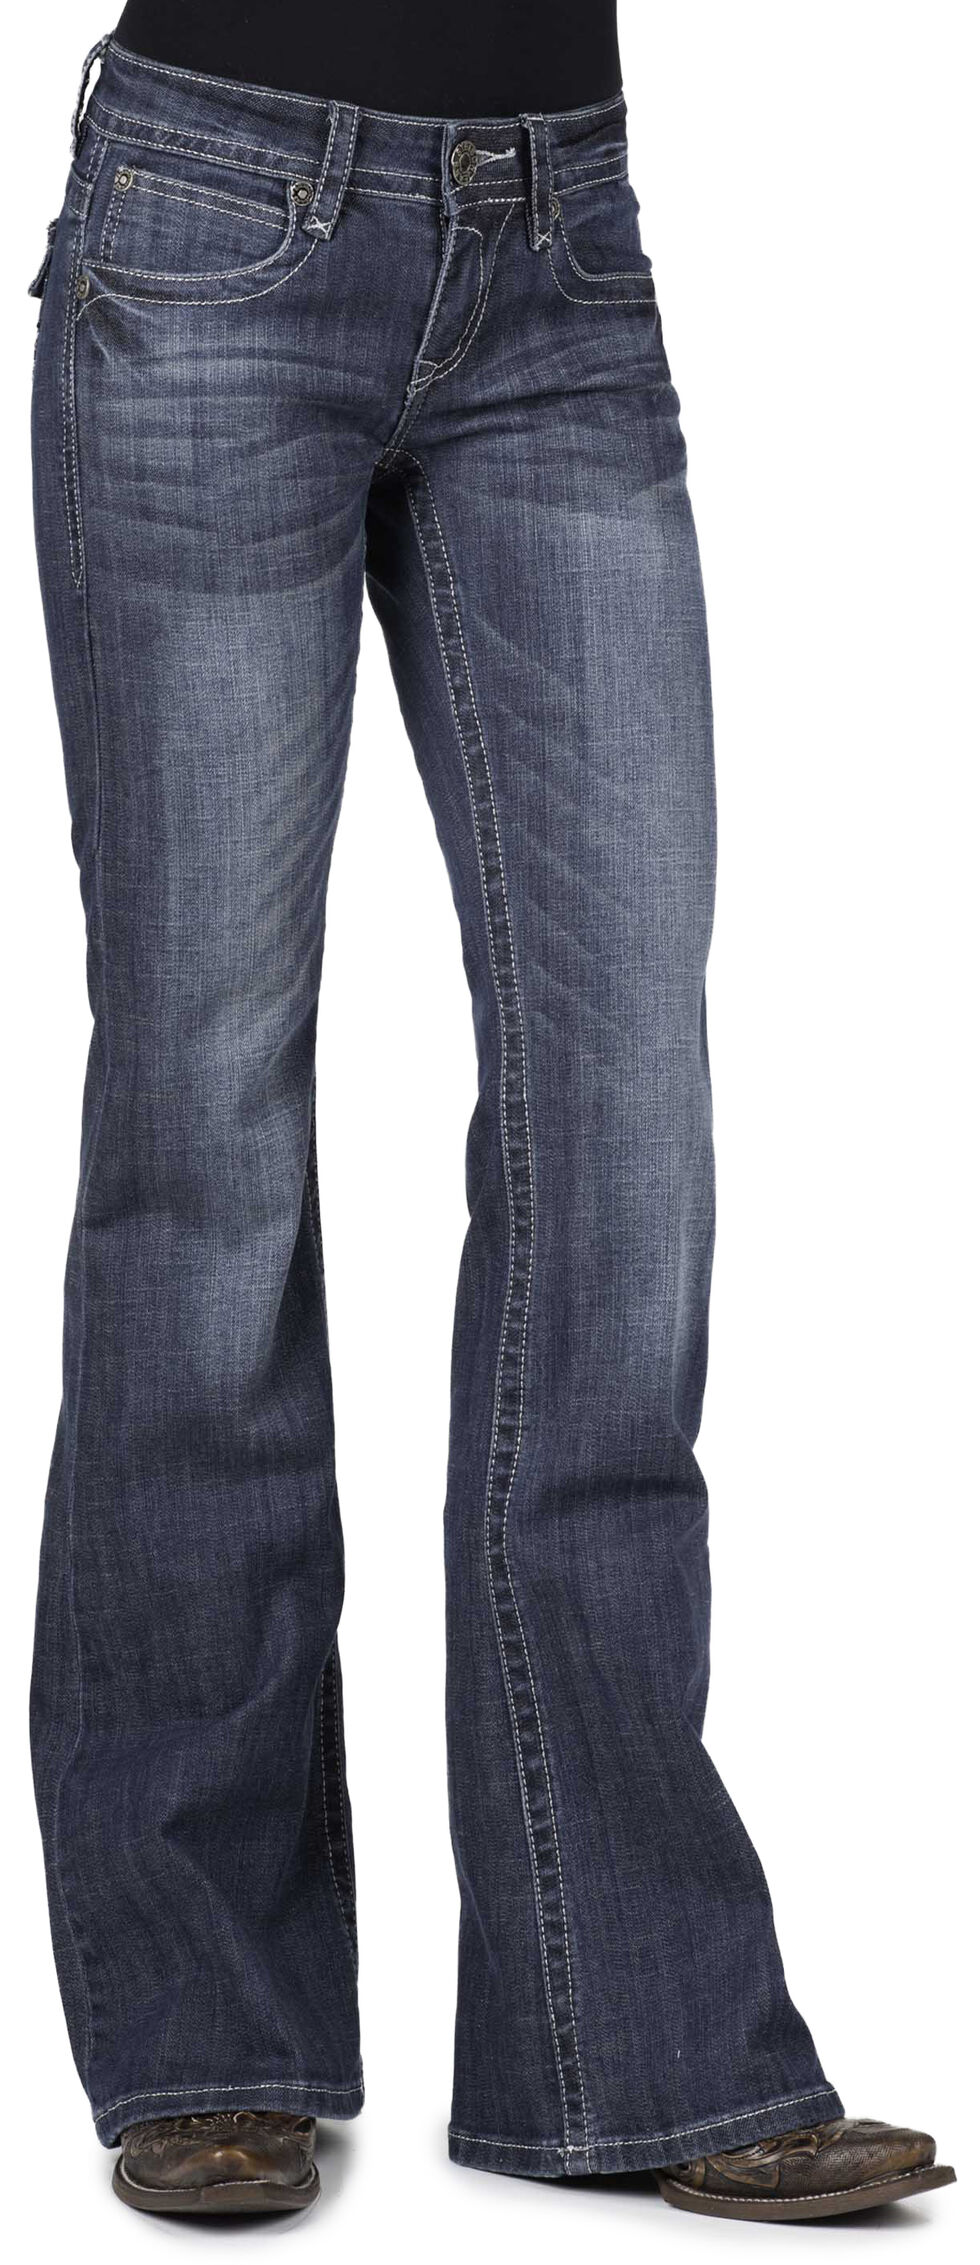 Stetson Women's 816 Classic Fit Flap V-Pocket Boot Cut Jeans, Denim, hi-res